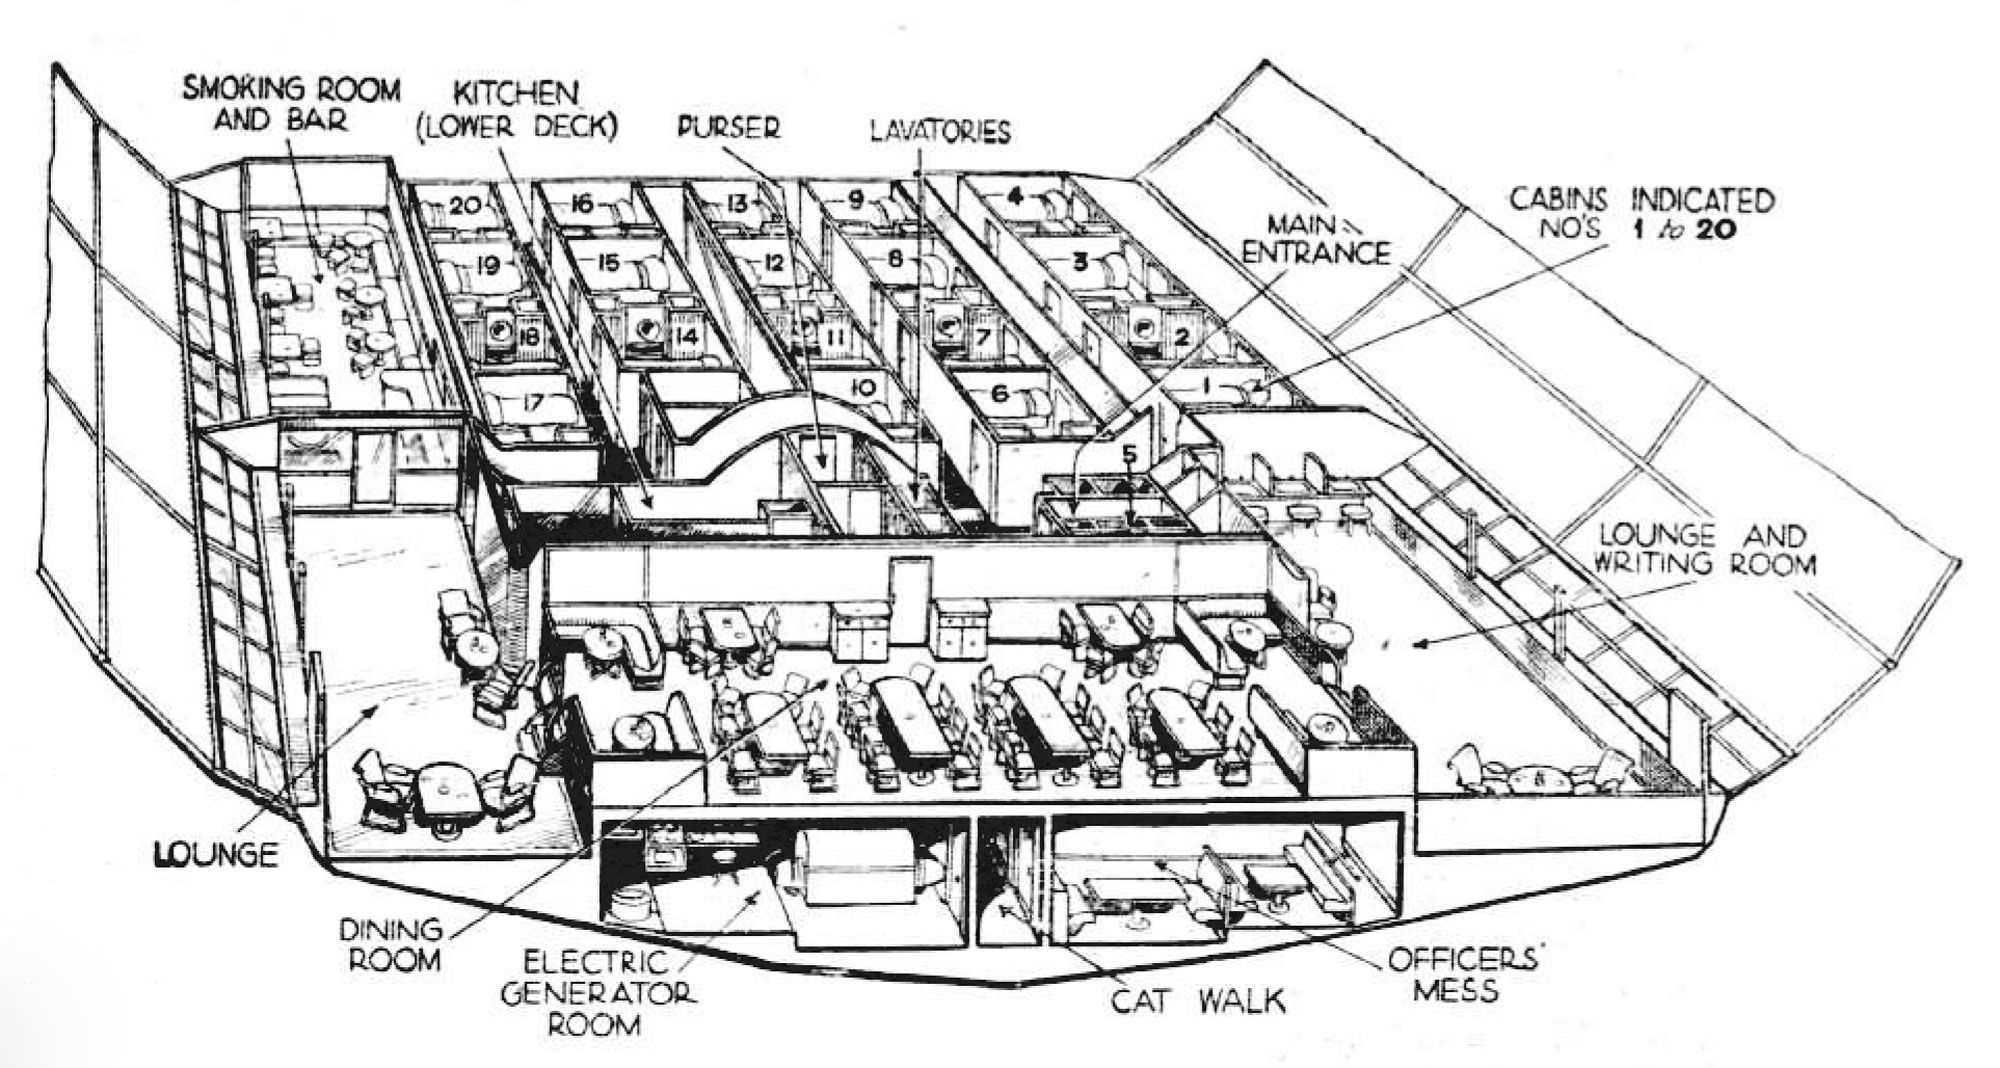 Lz 130 Graf Zeppelin Interior